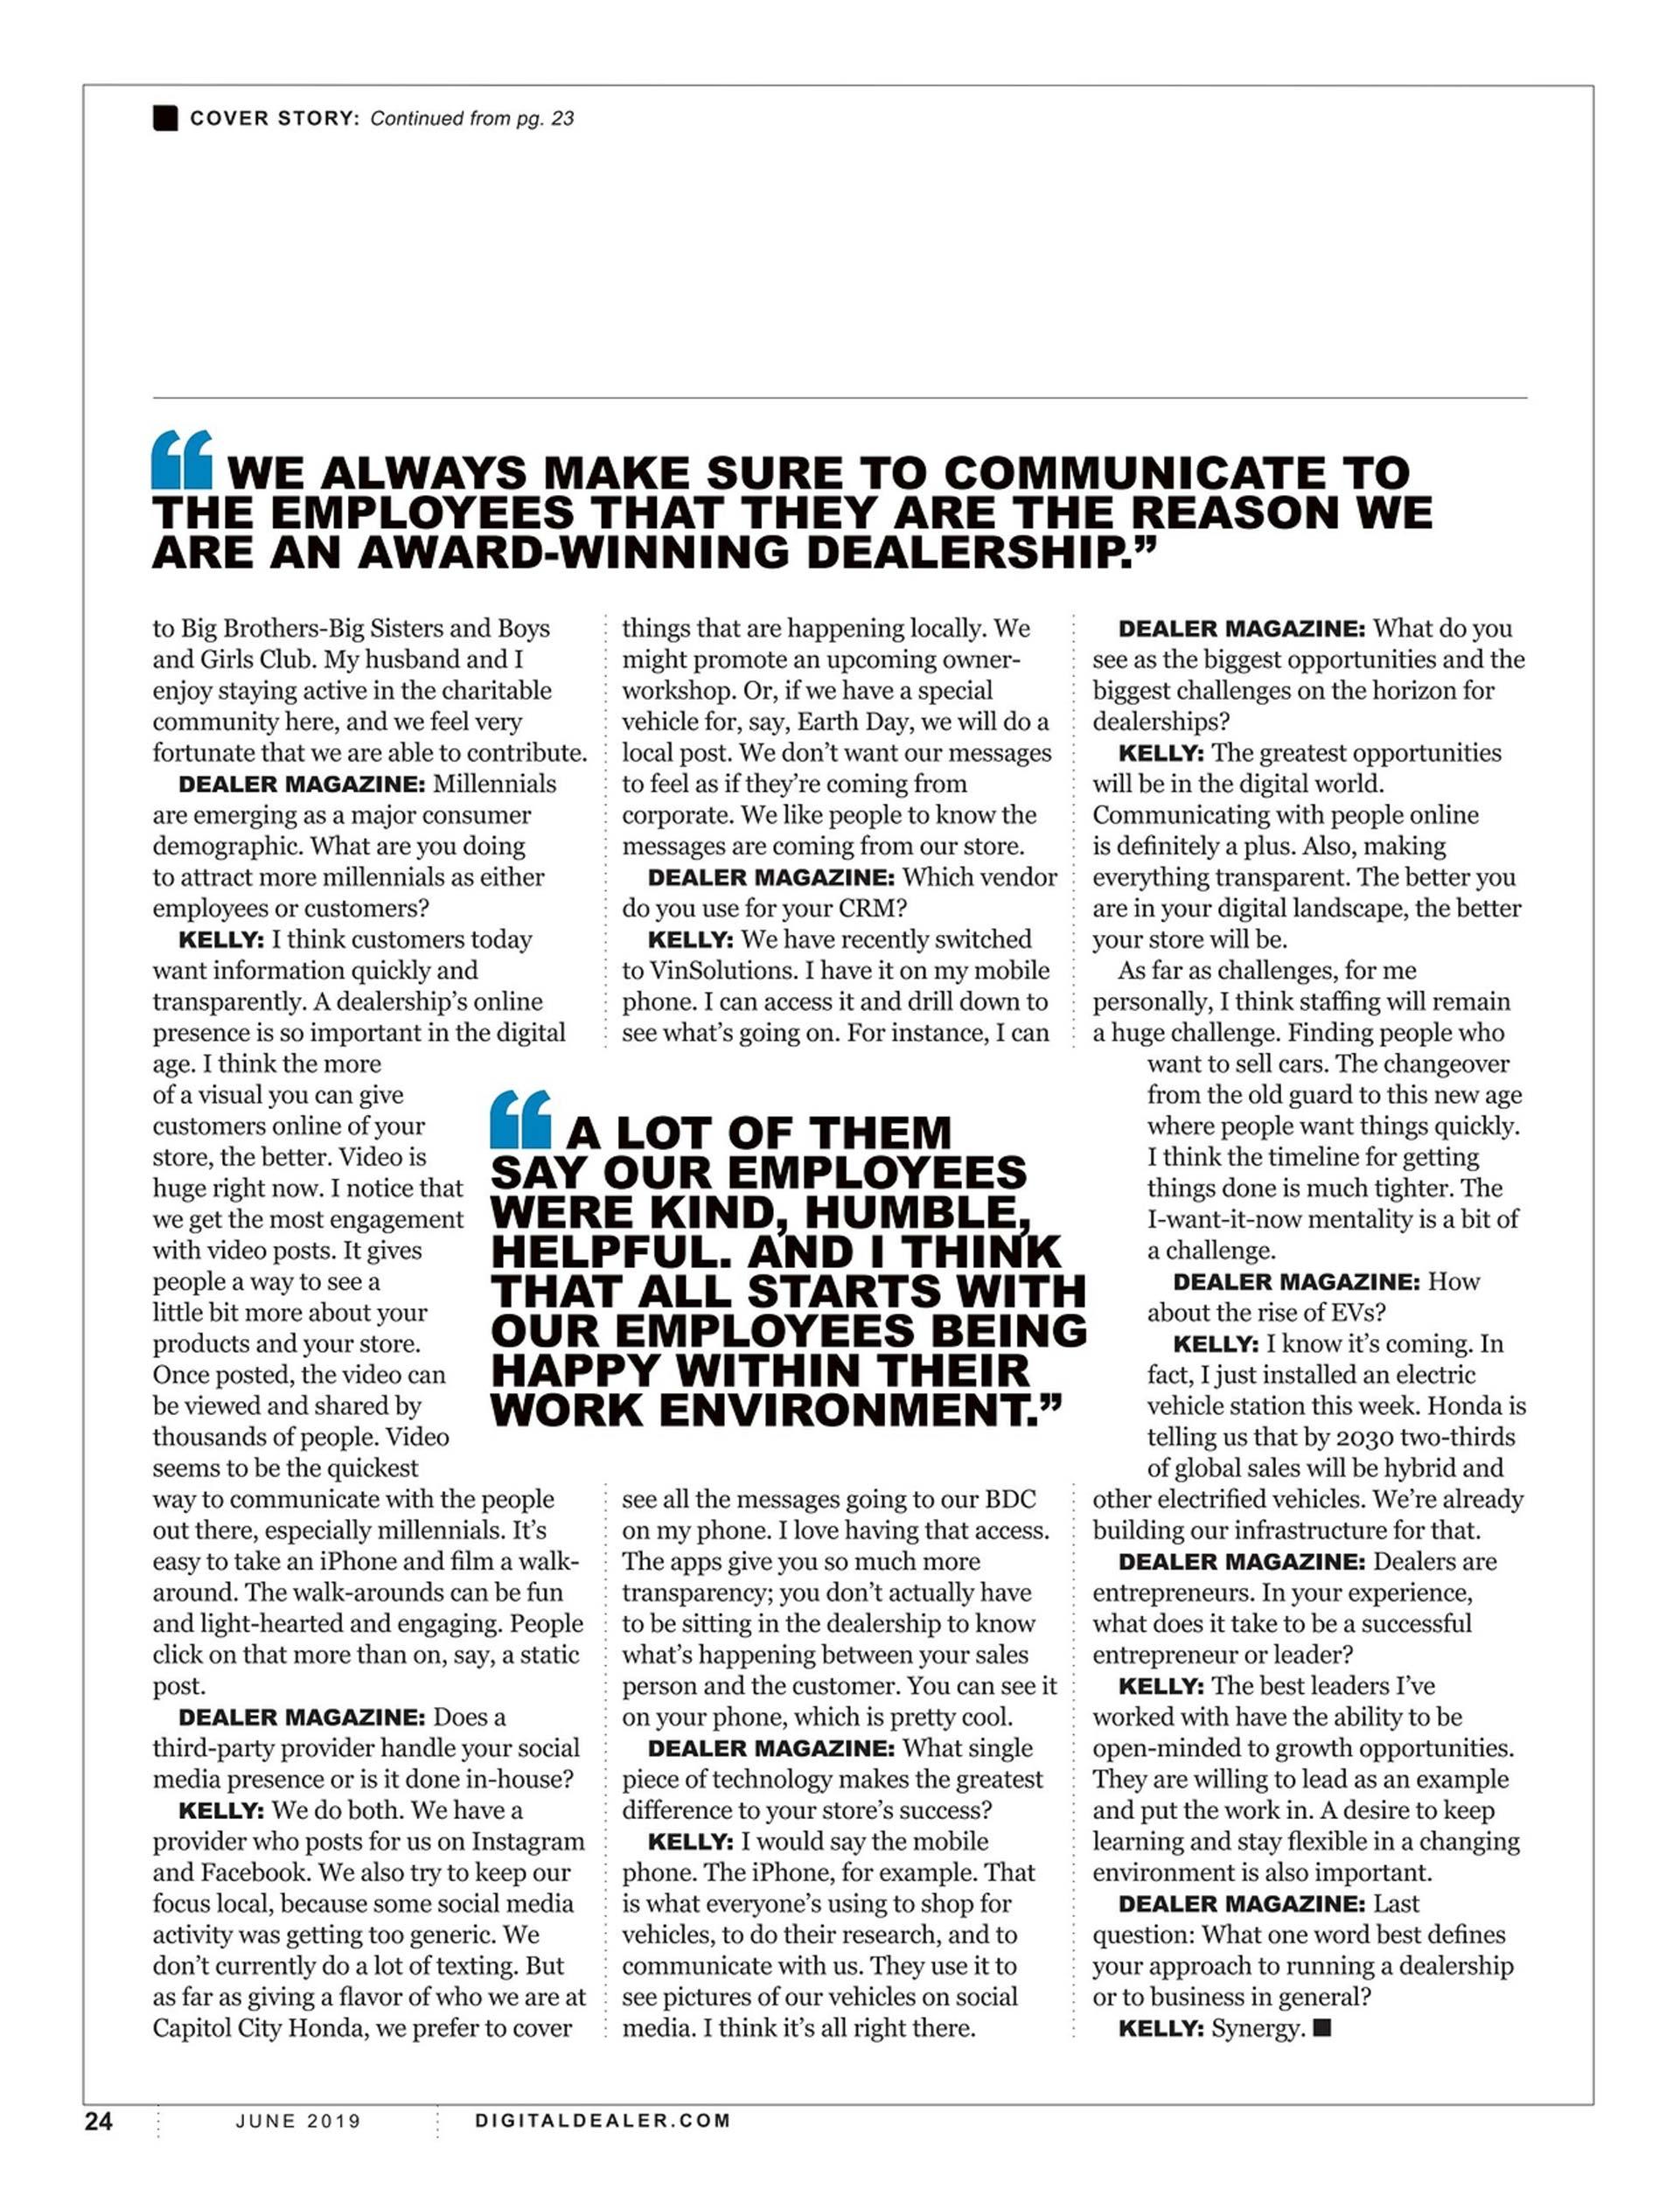 Capitol City Honda in Dealer Magazine 6